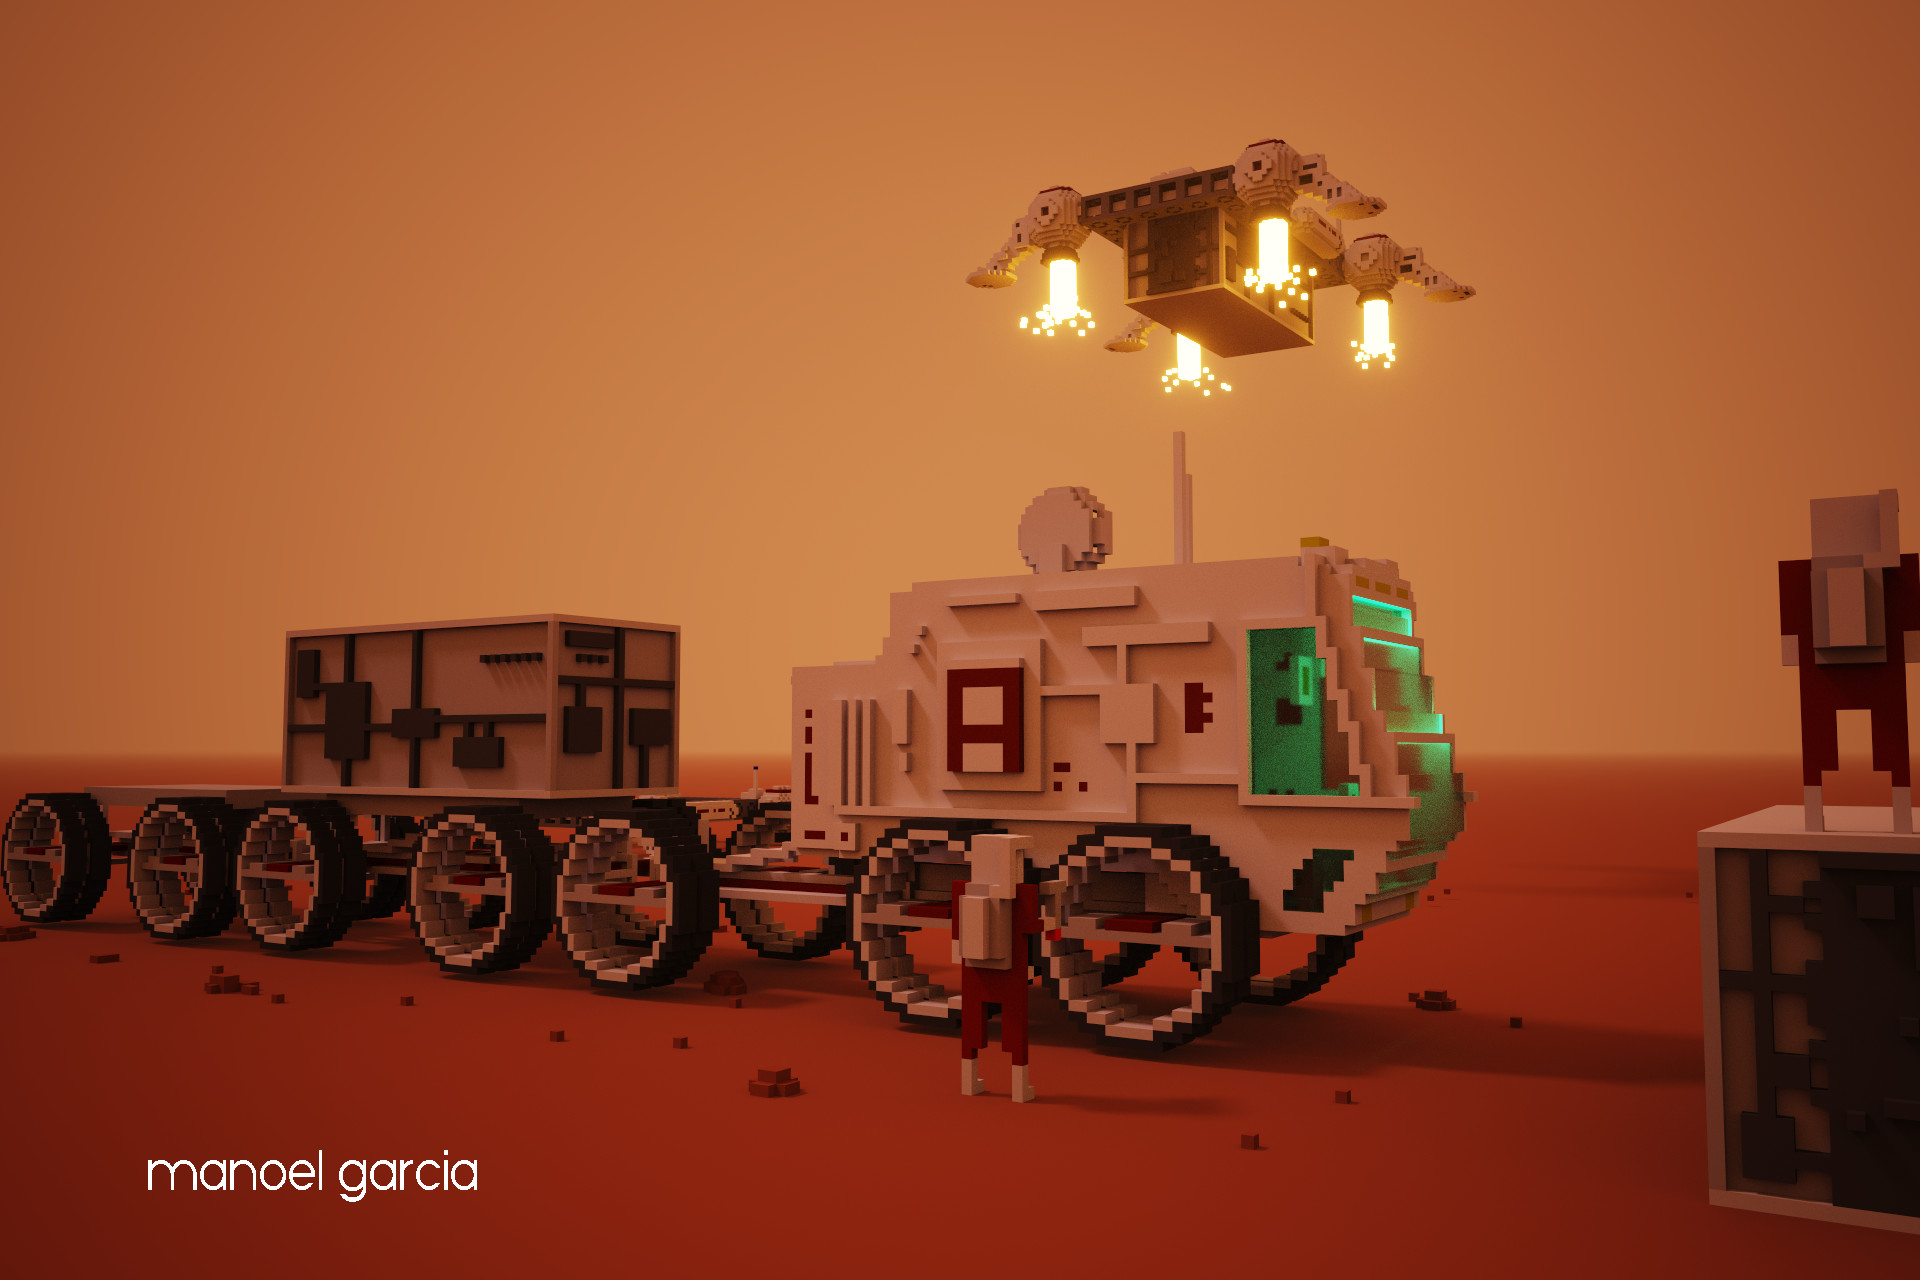 Arriving in Mars